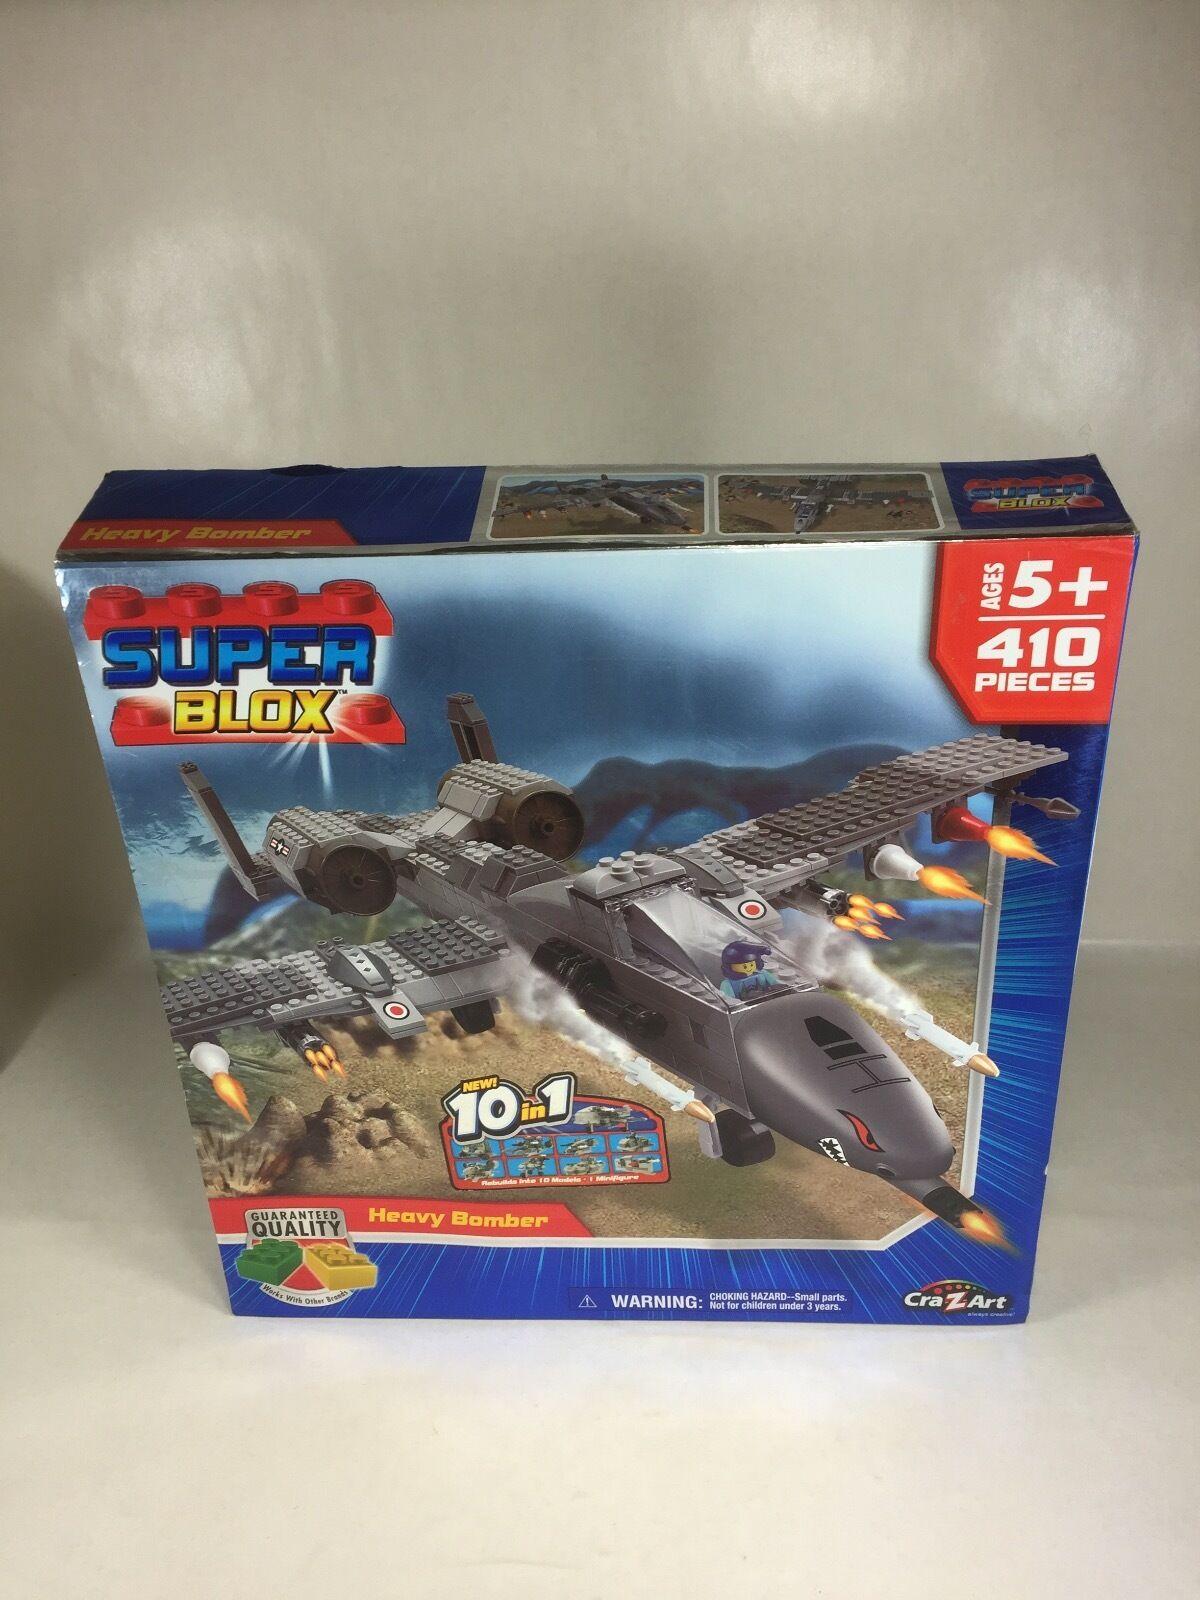 Car-Z-Art Super Blox Heavy Bomber - 410 Pieces Large Box OPEN BOX SEALED CONTENT